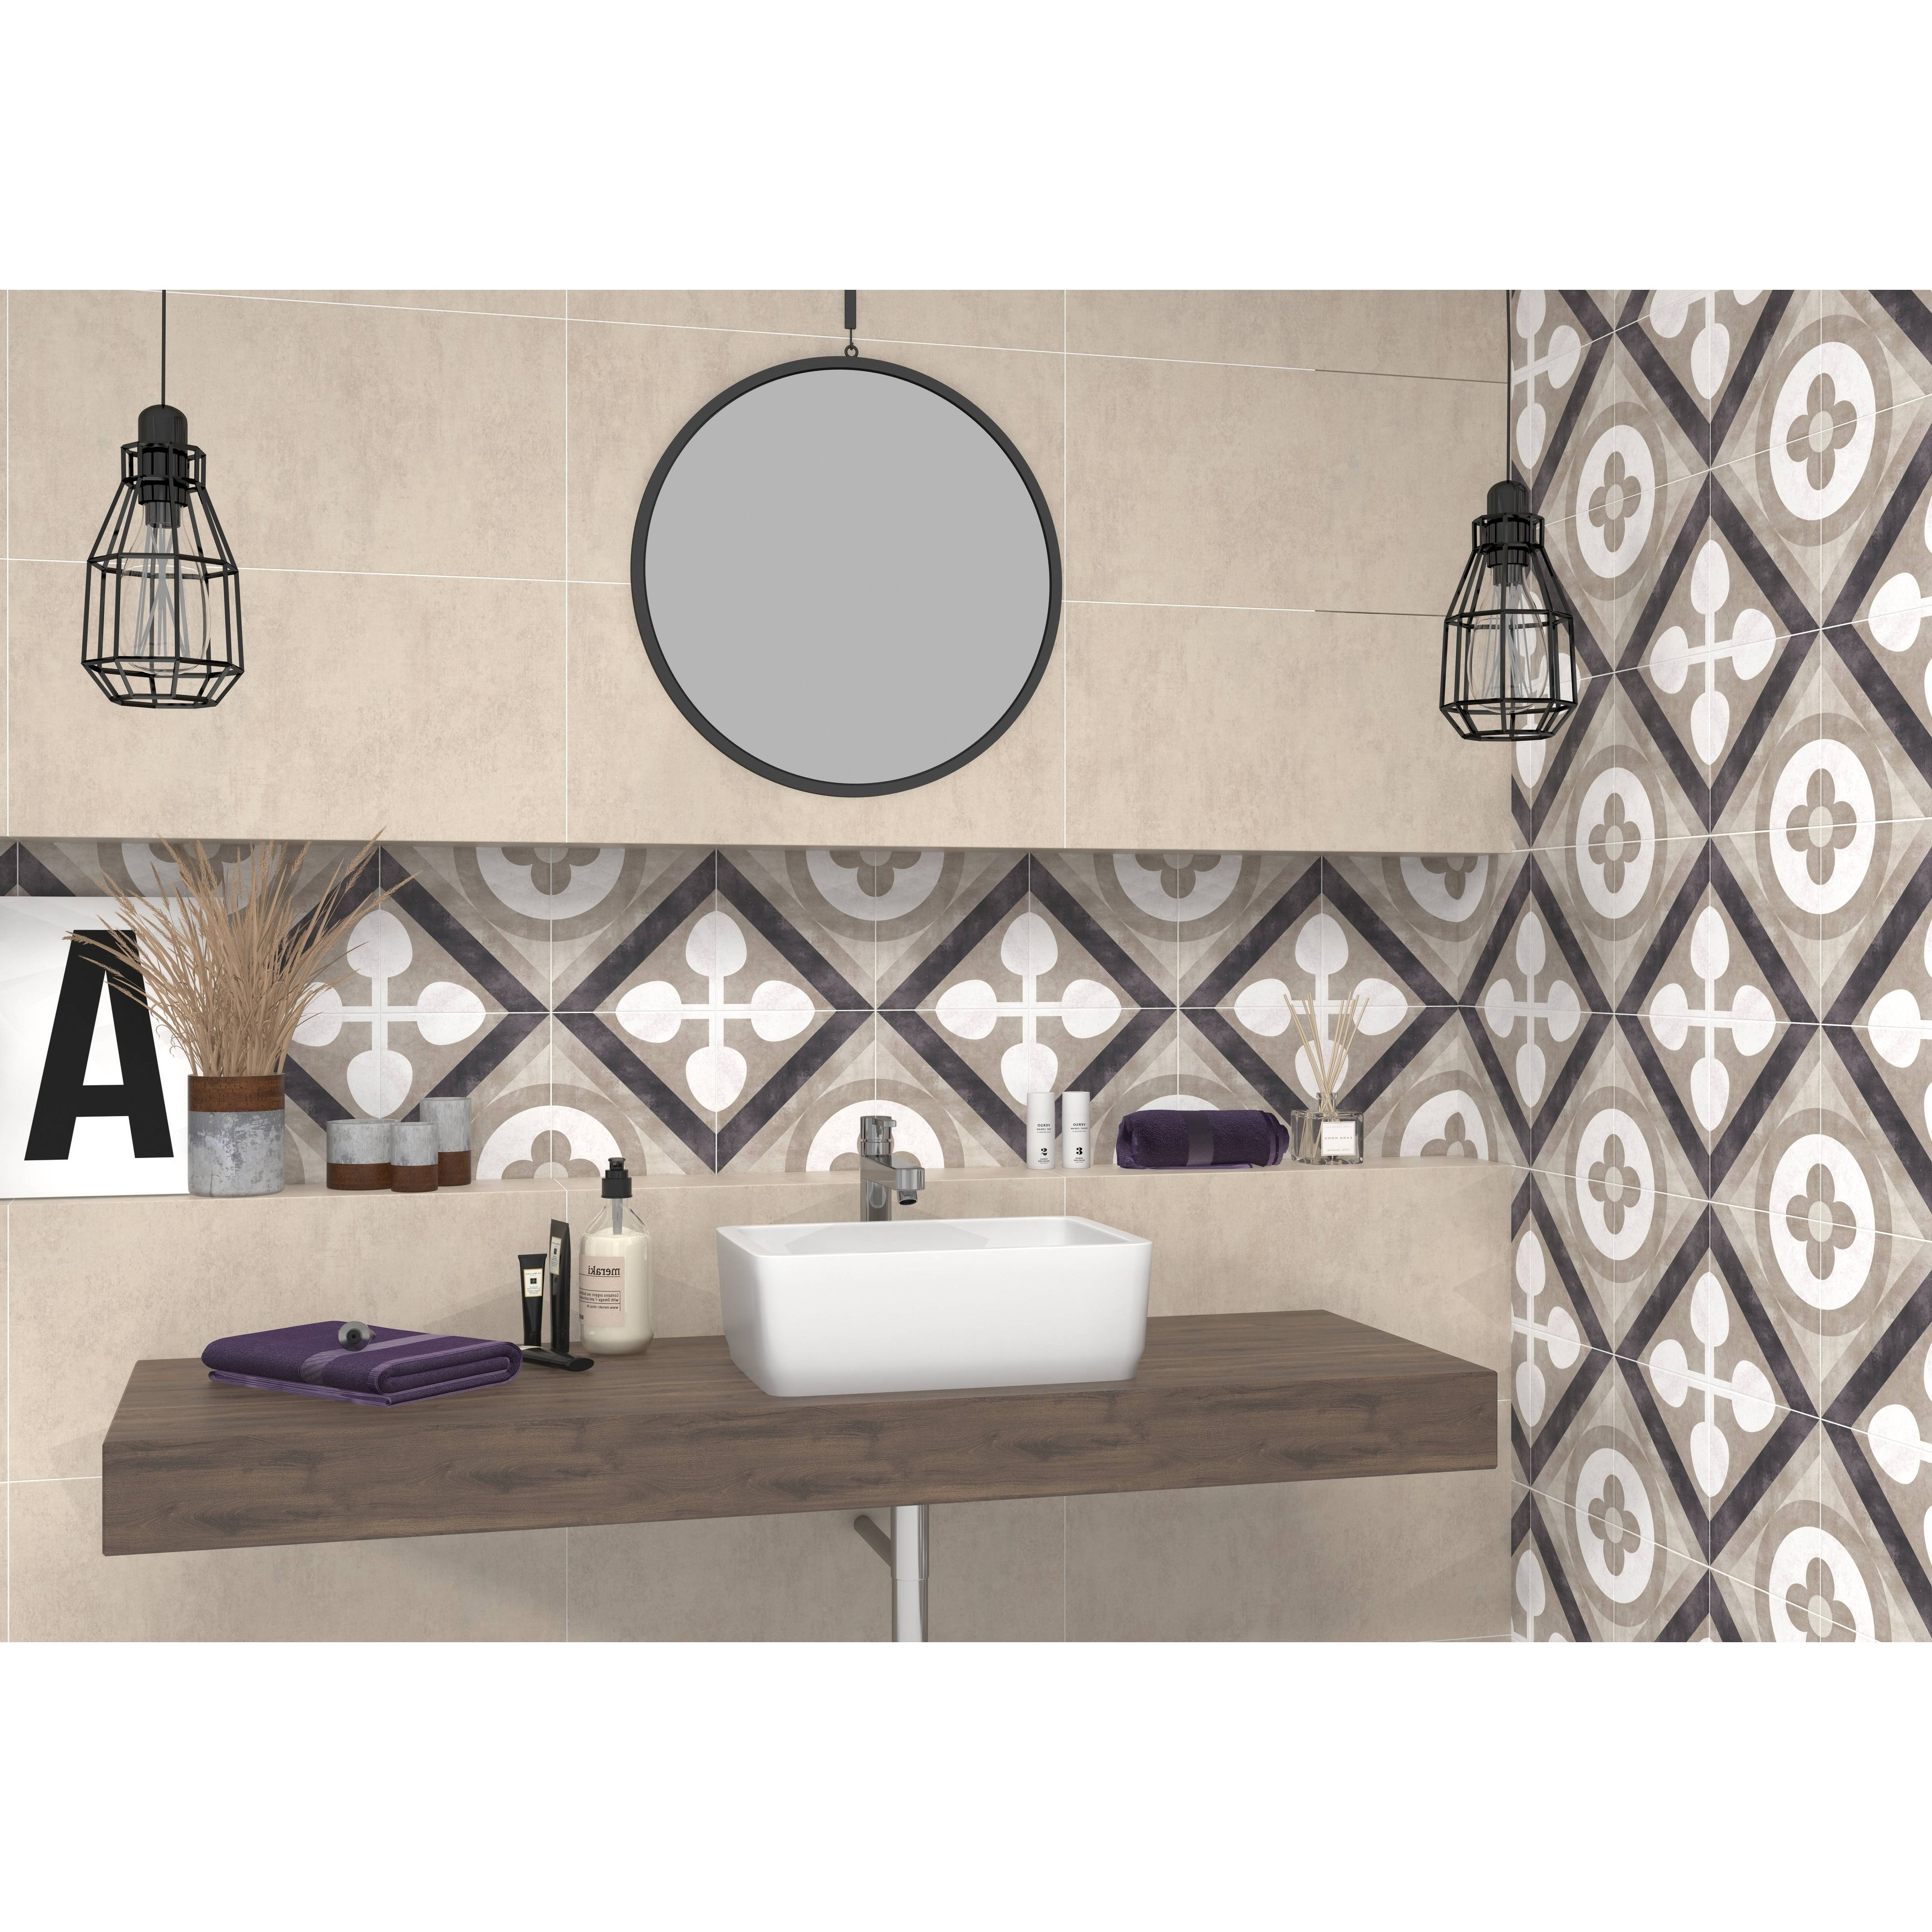 6x6 Joya Beige Porcelain Floor /Wall Tile (6.6 Sq. Ft./ 6 pcs box)